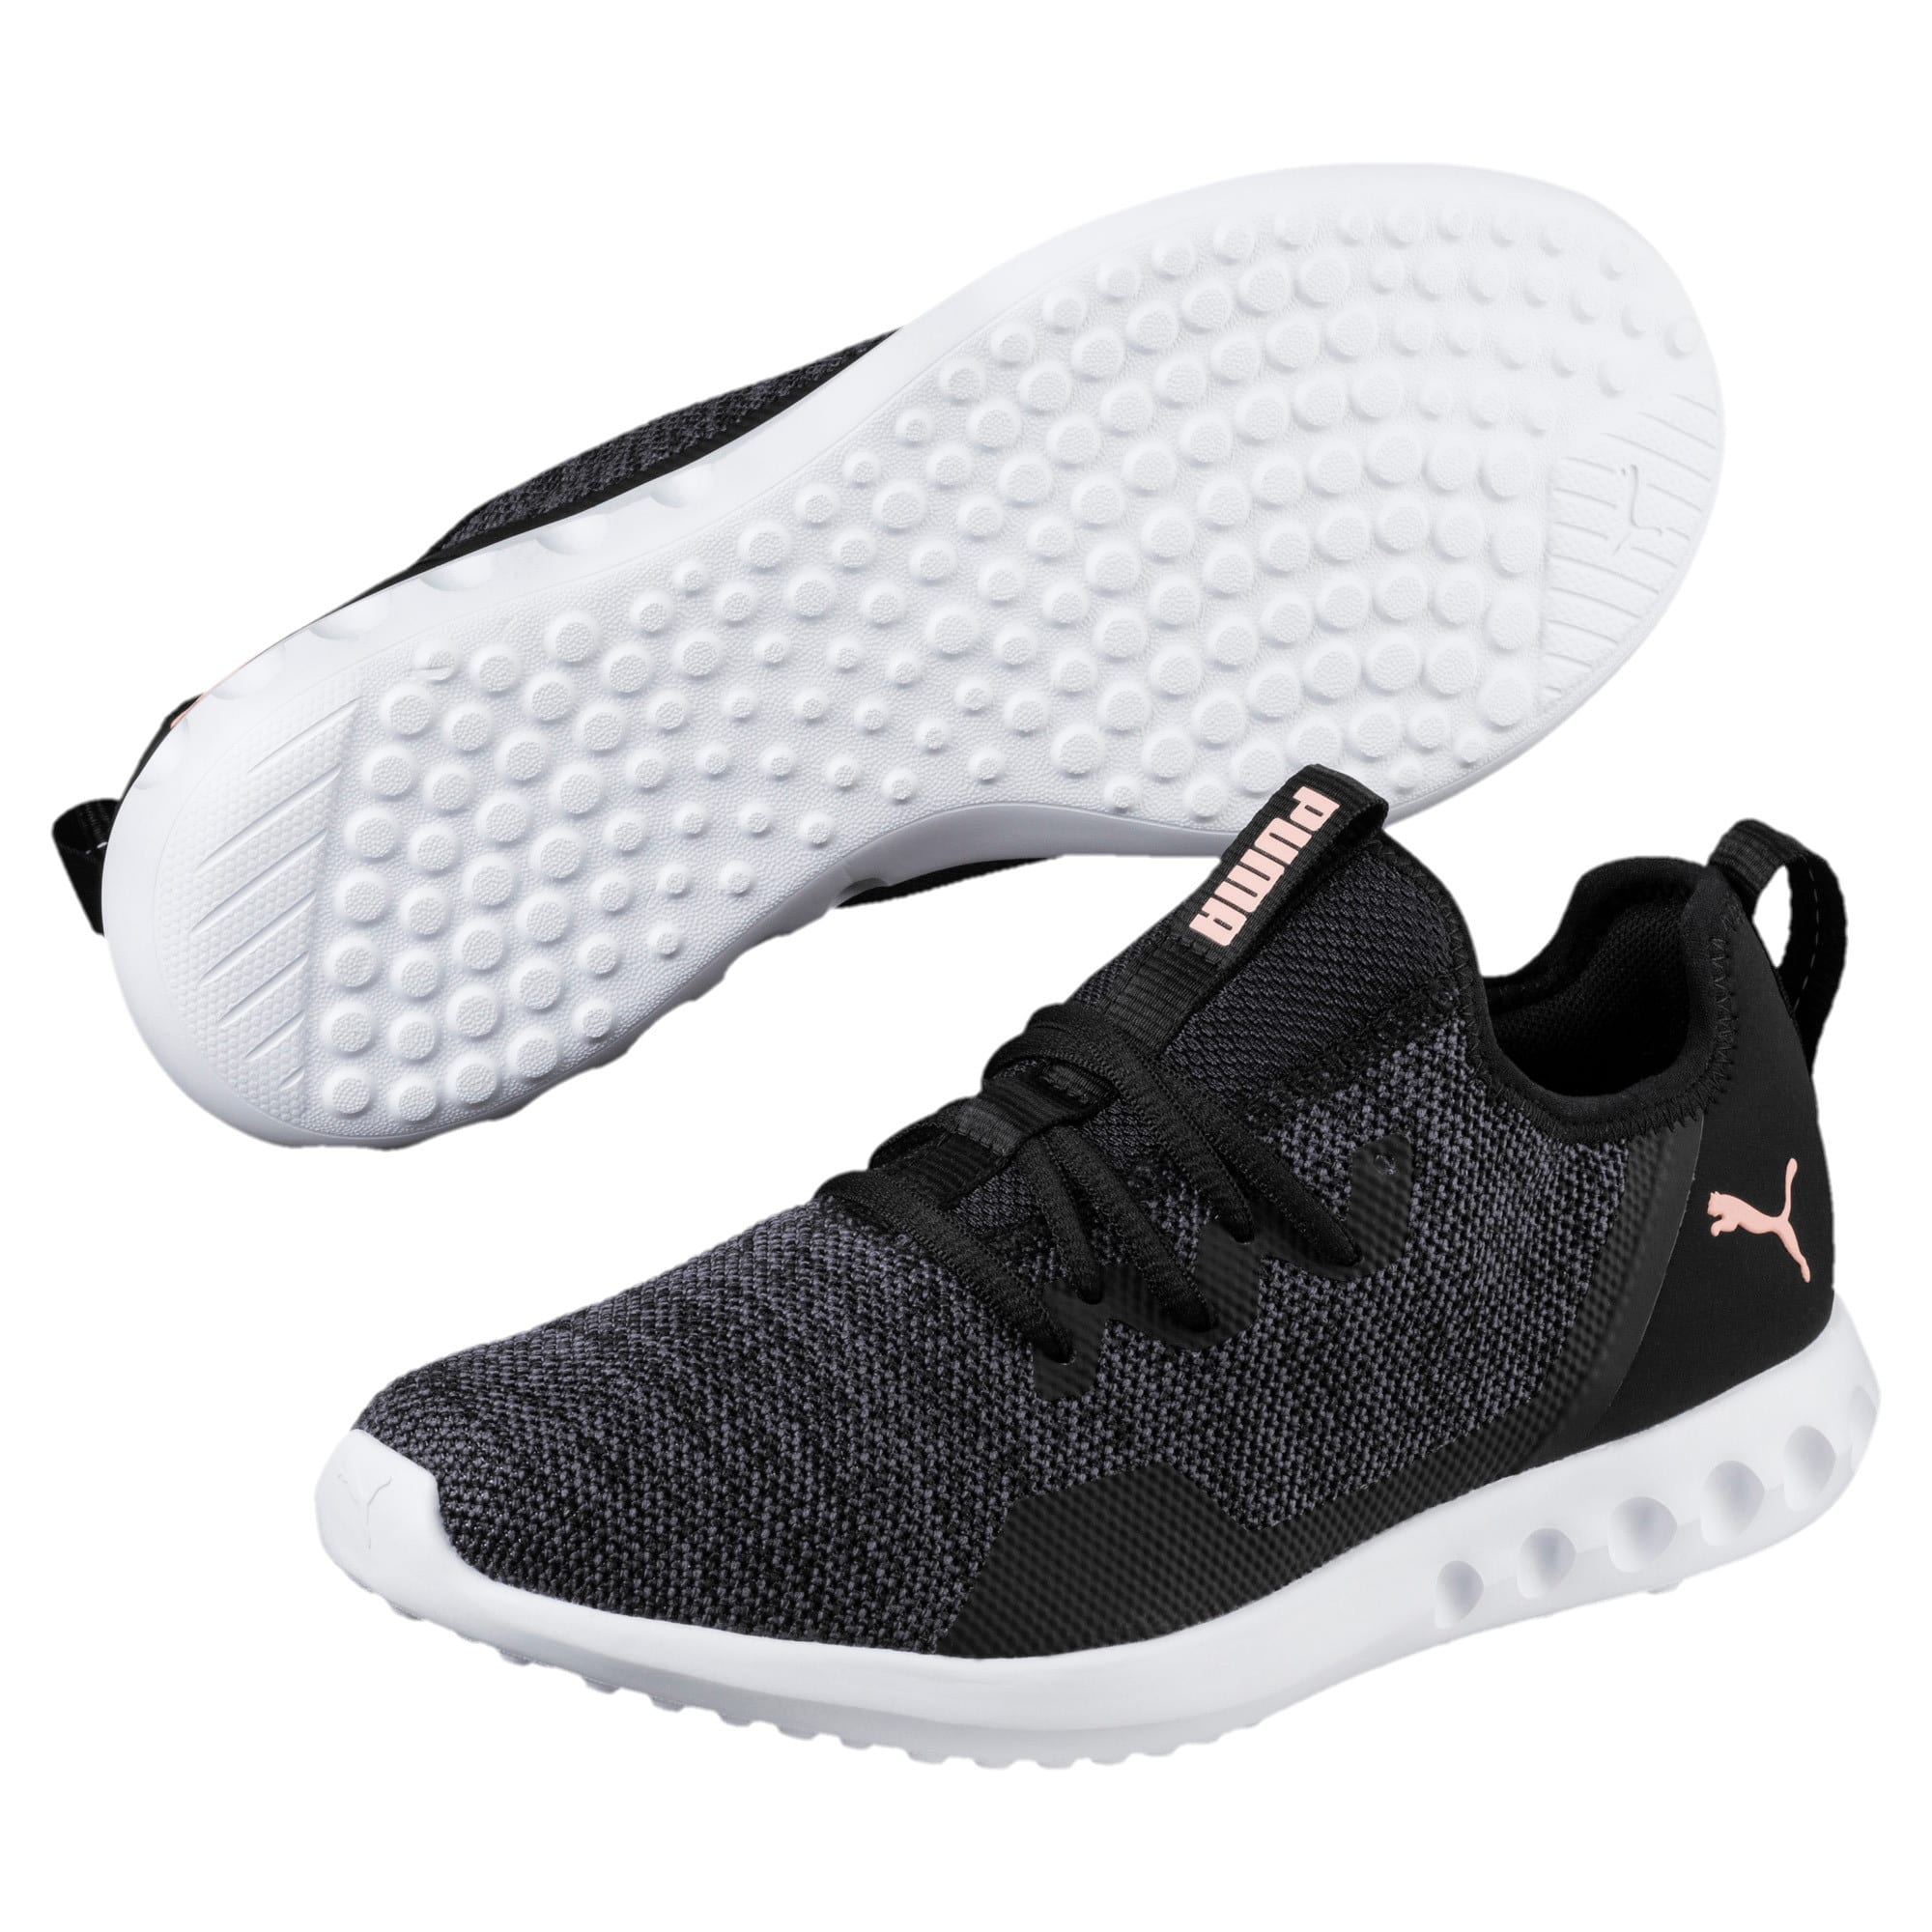 Thumbnail 1 of Carson 2 X Knit Women's Running Shoes, Puma Black-Periscope, medium